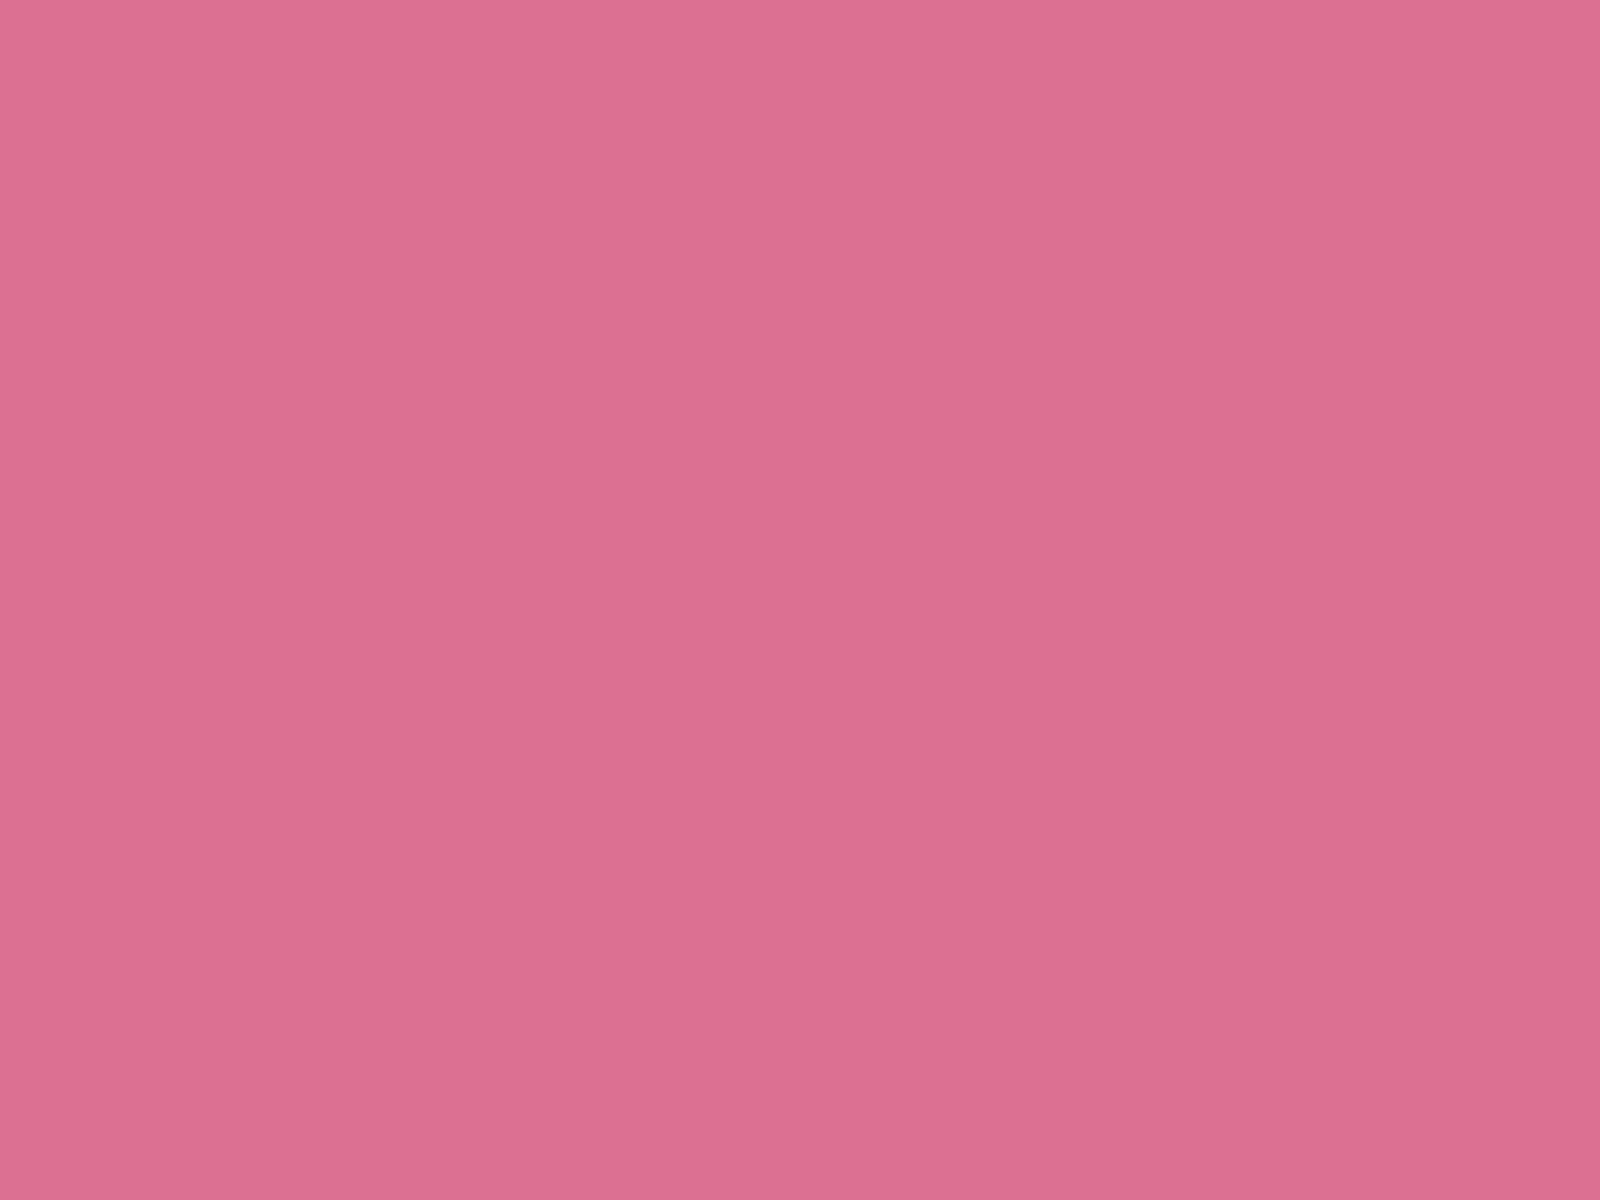 1600x1200 Pale Violet-red Solid Color Background